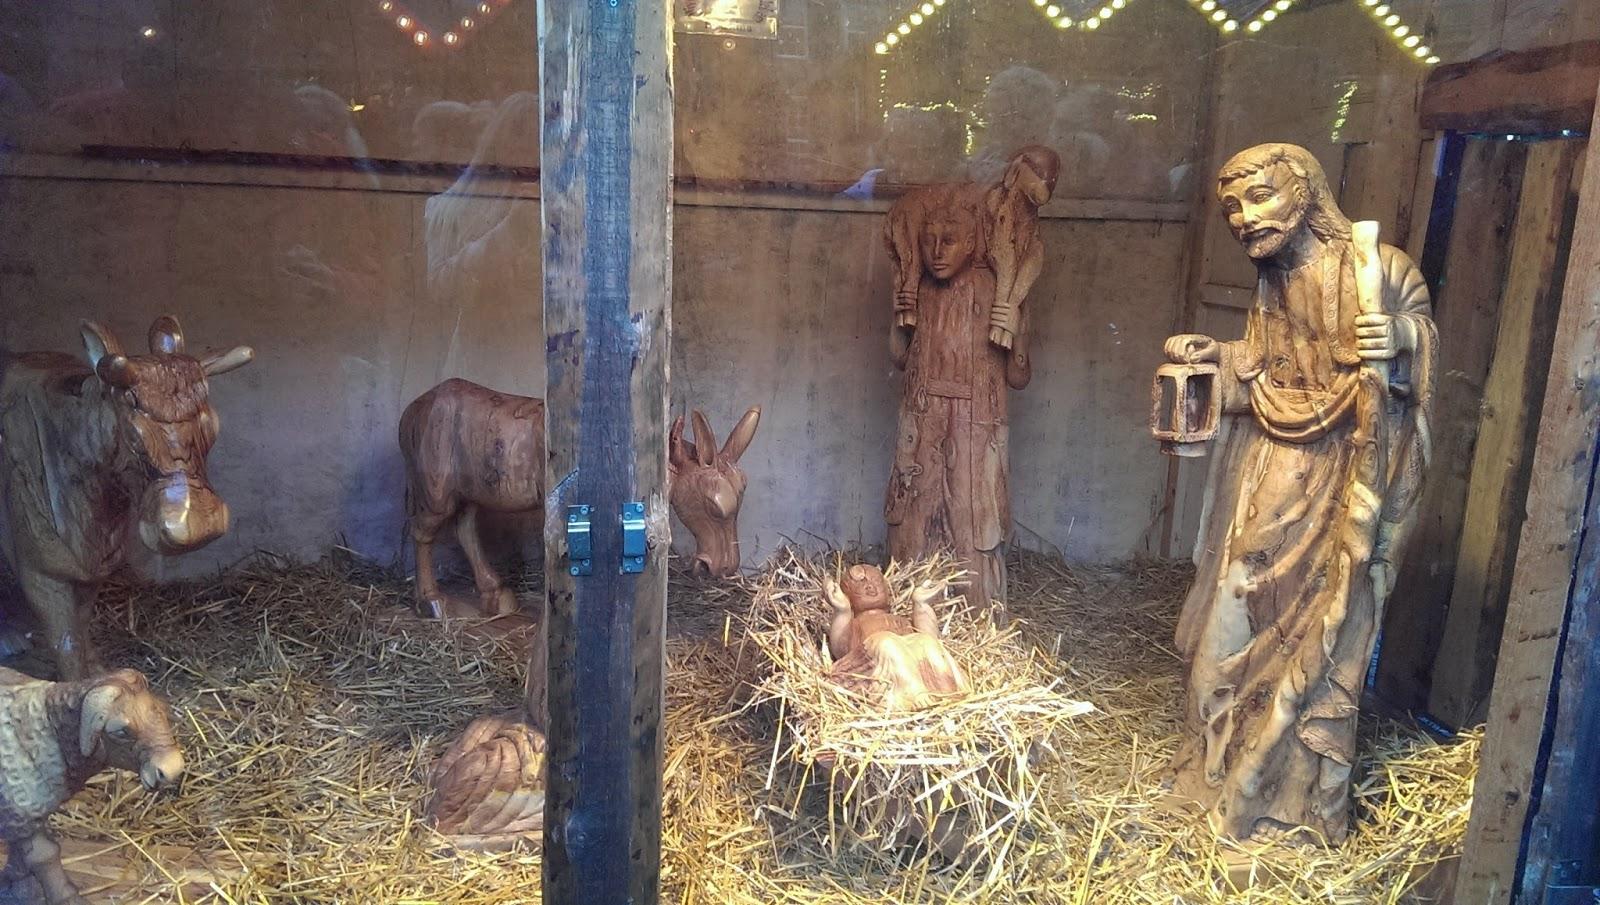 stad duitsland kerstspullen